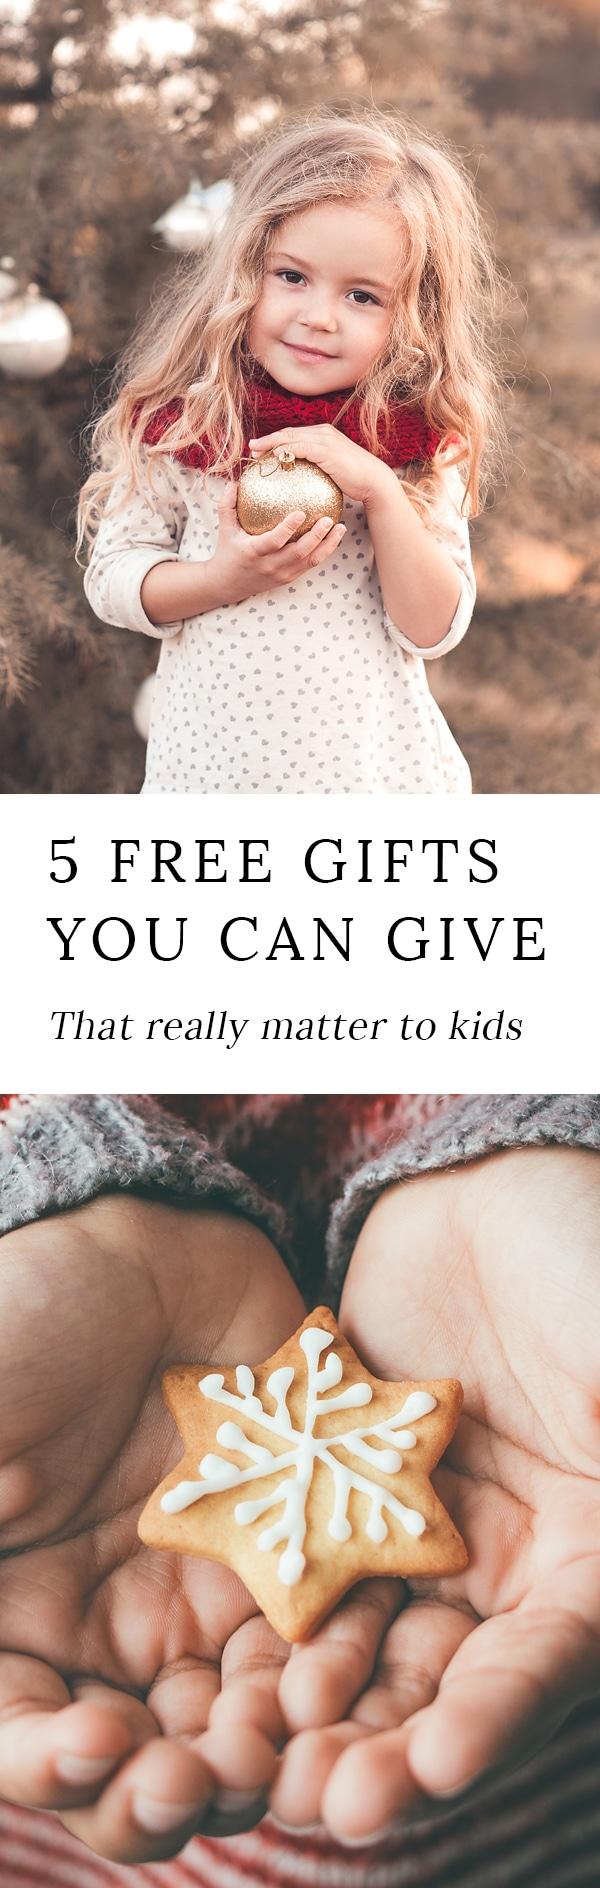 What Kids Really Want for Christmas via @firefliesandmudpies